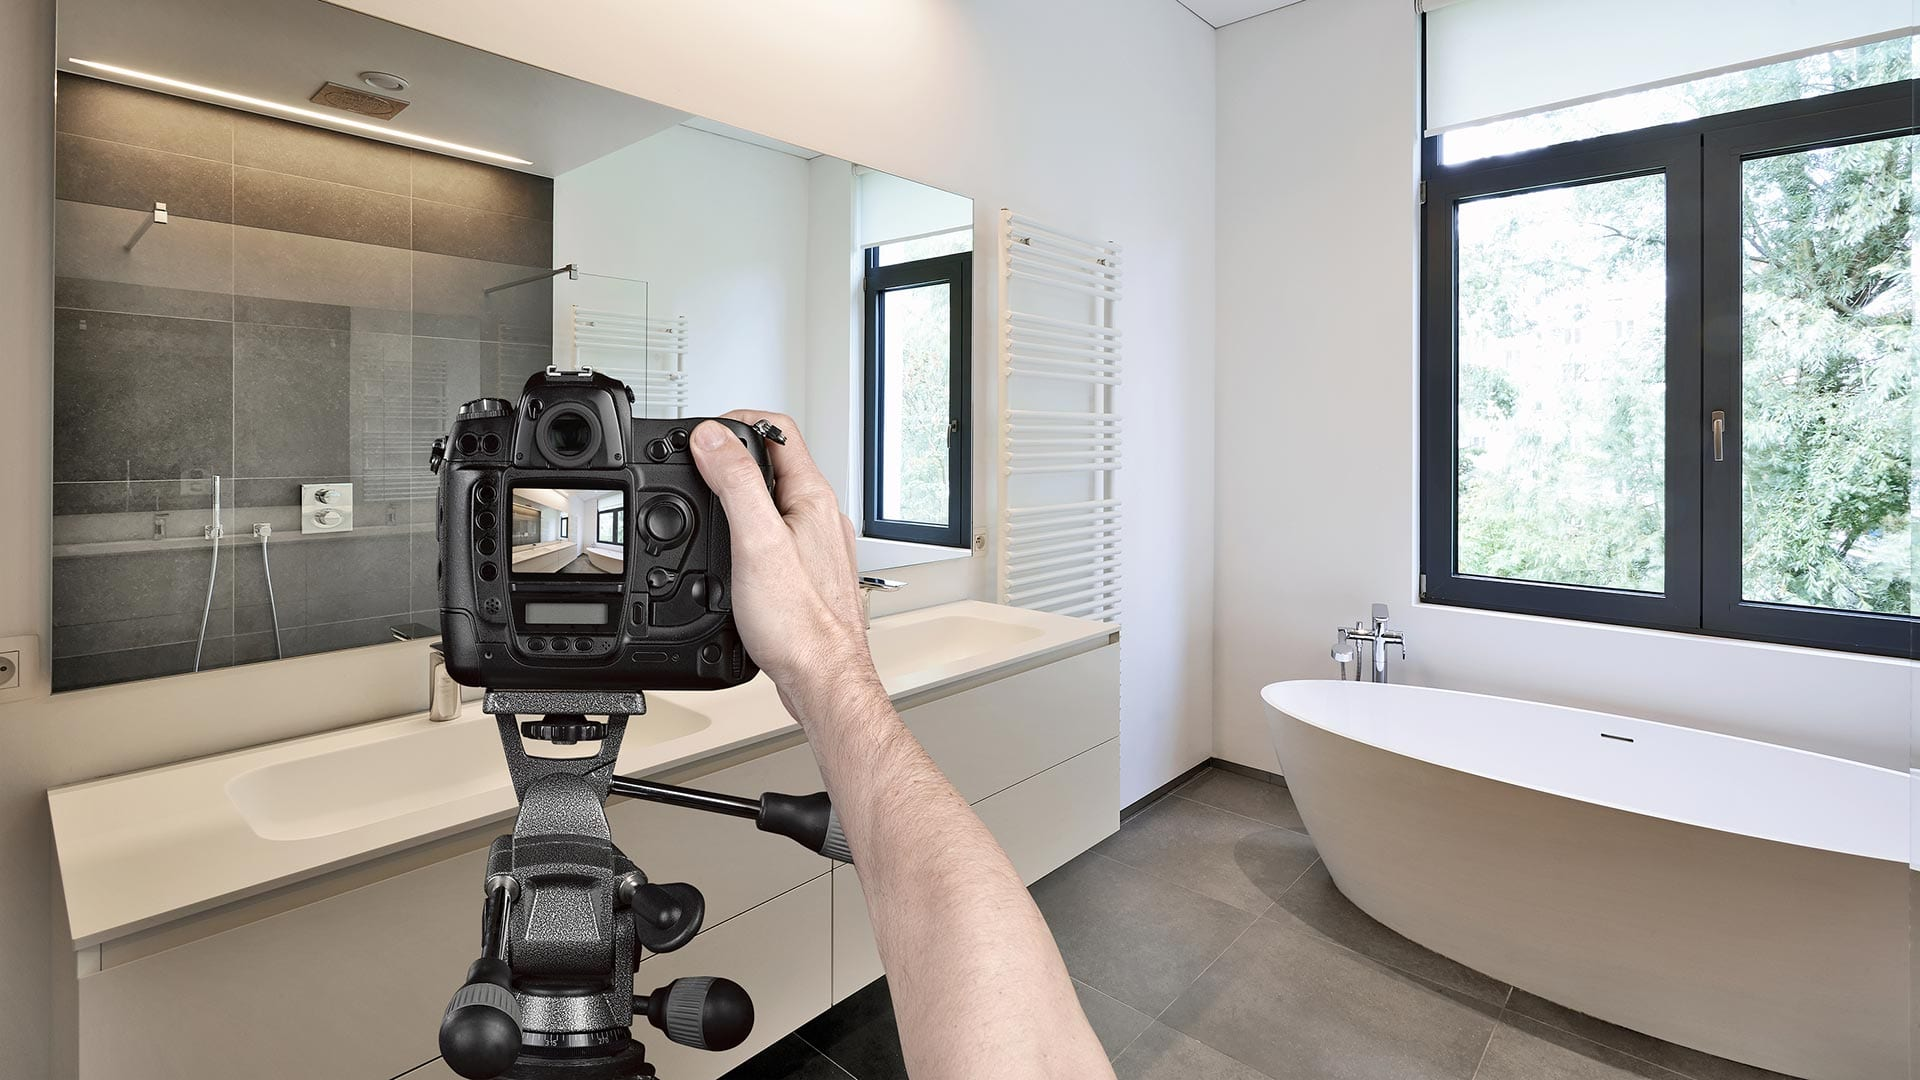 Real Estate Video Marketing In Calgary & Area